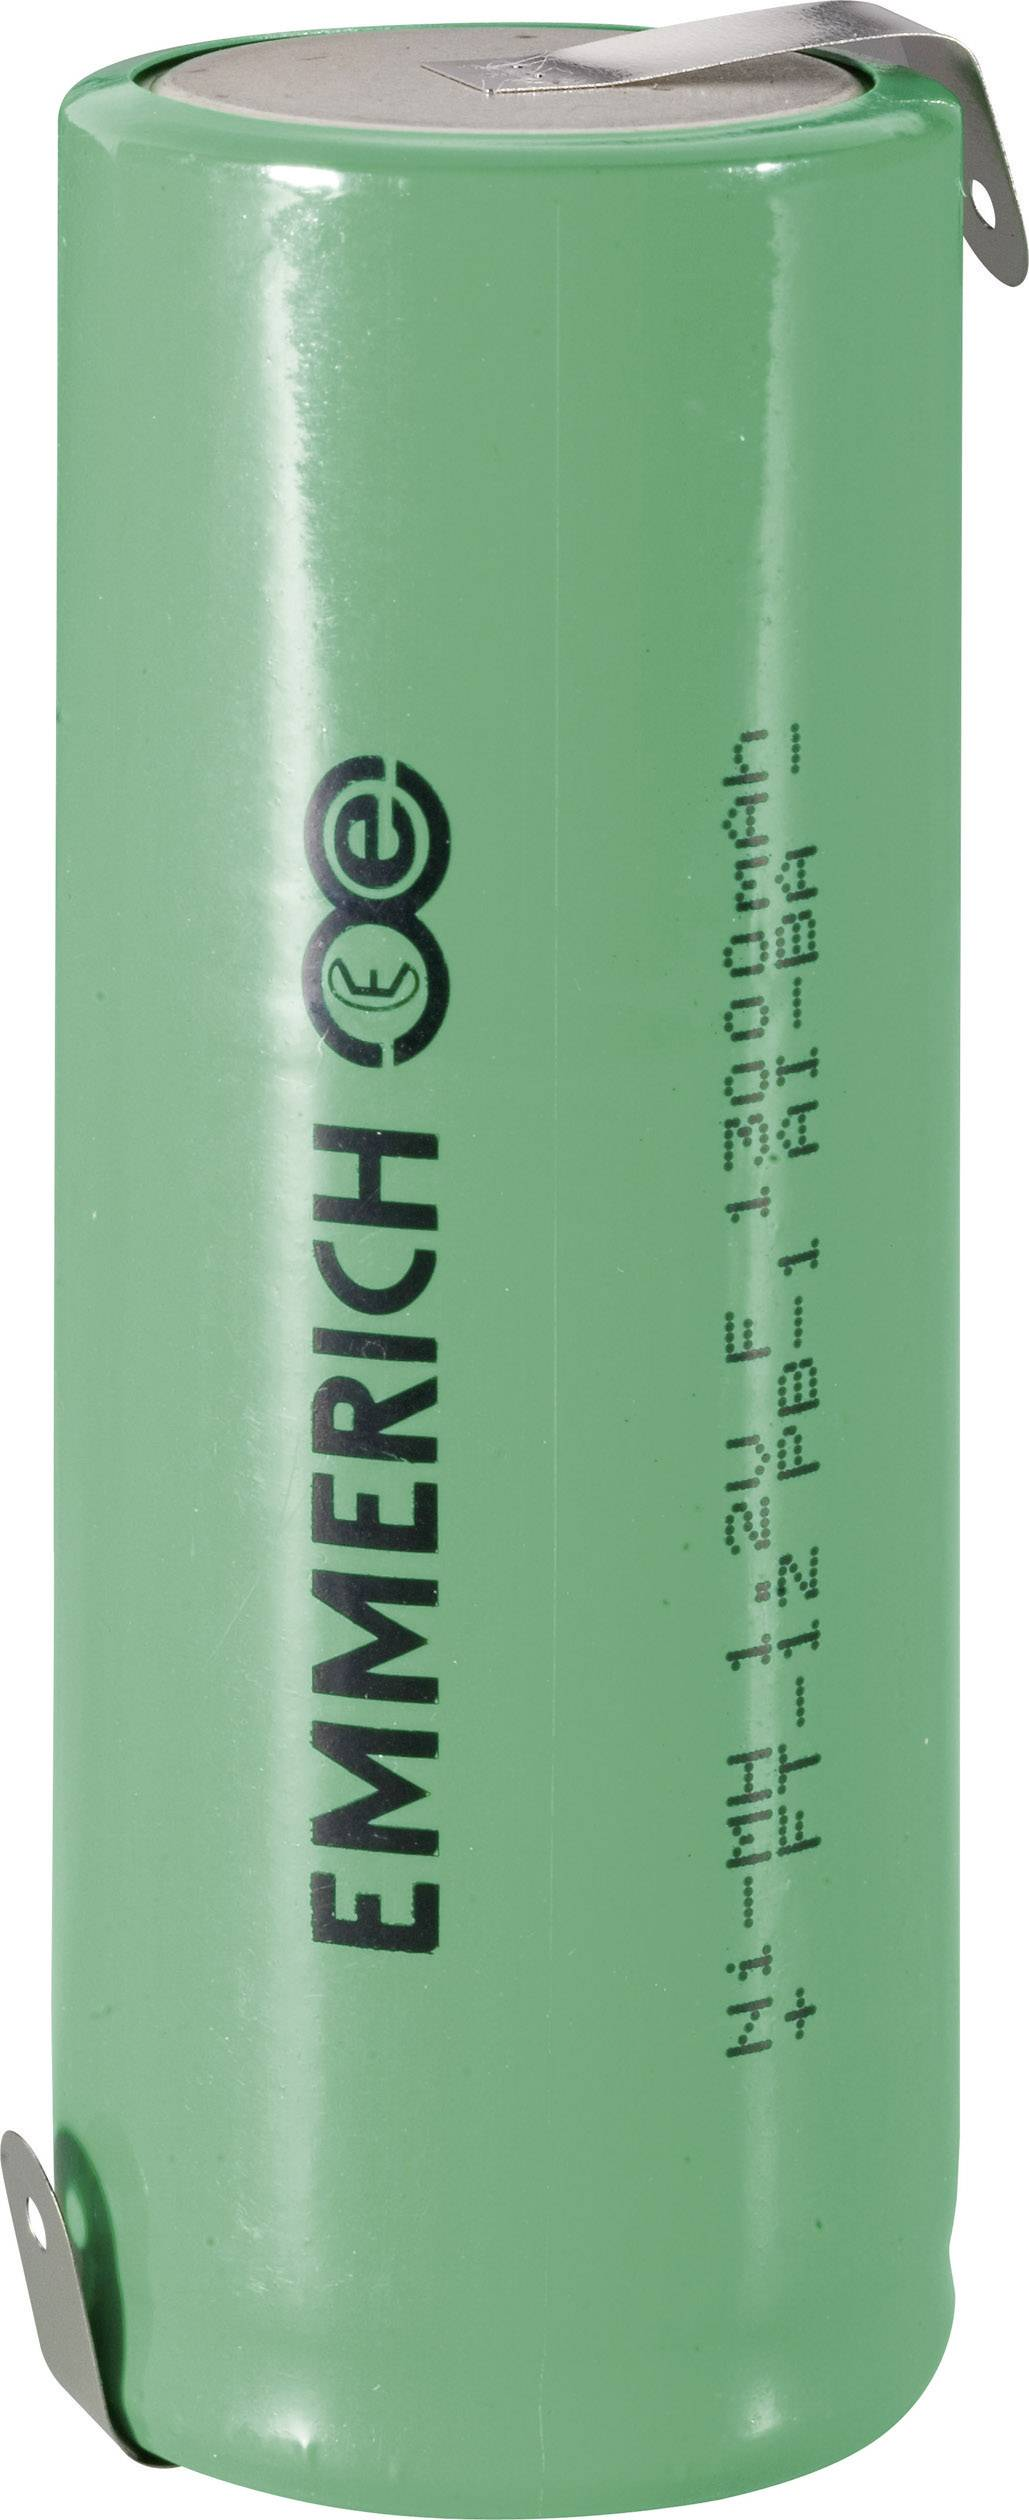 Emmerich NiMH-akumulátory so Z spájkovacími očkami F 13000 MAH FT-1Z